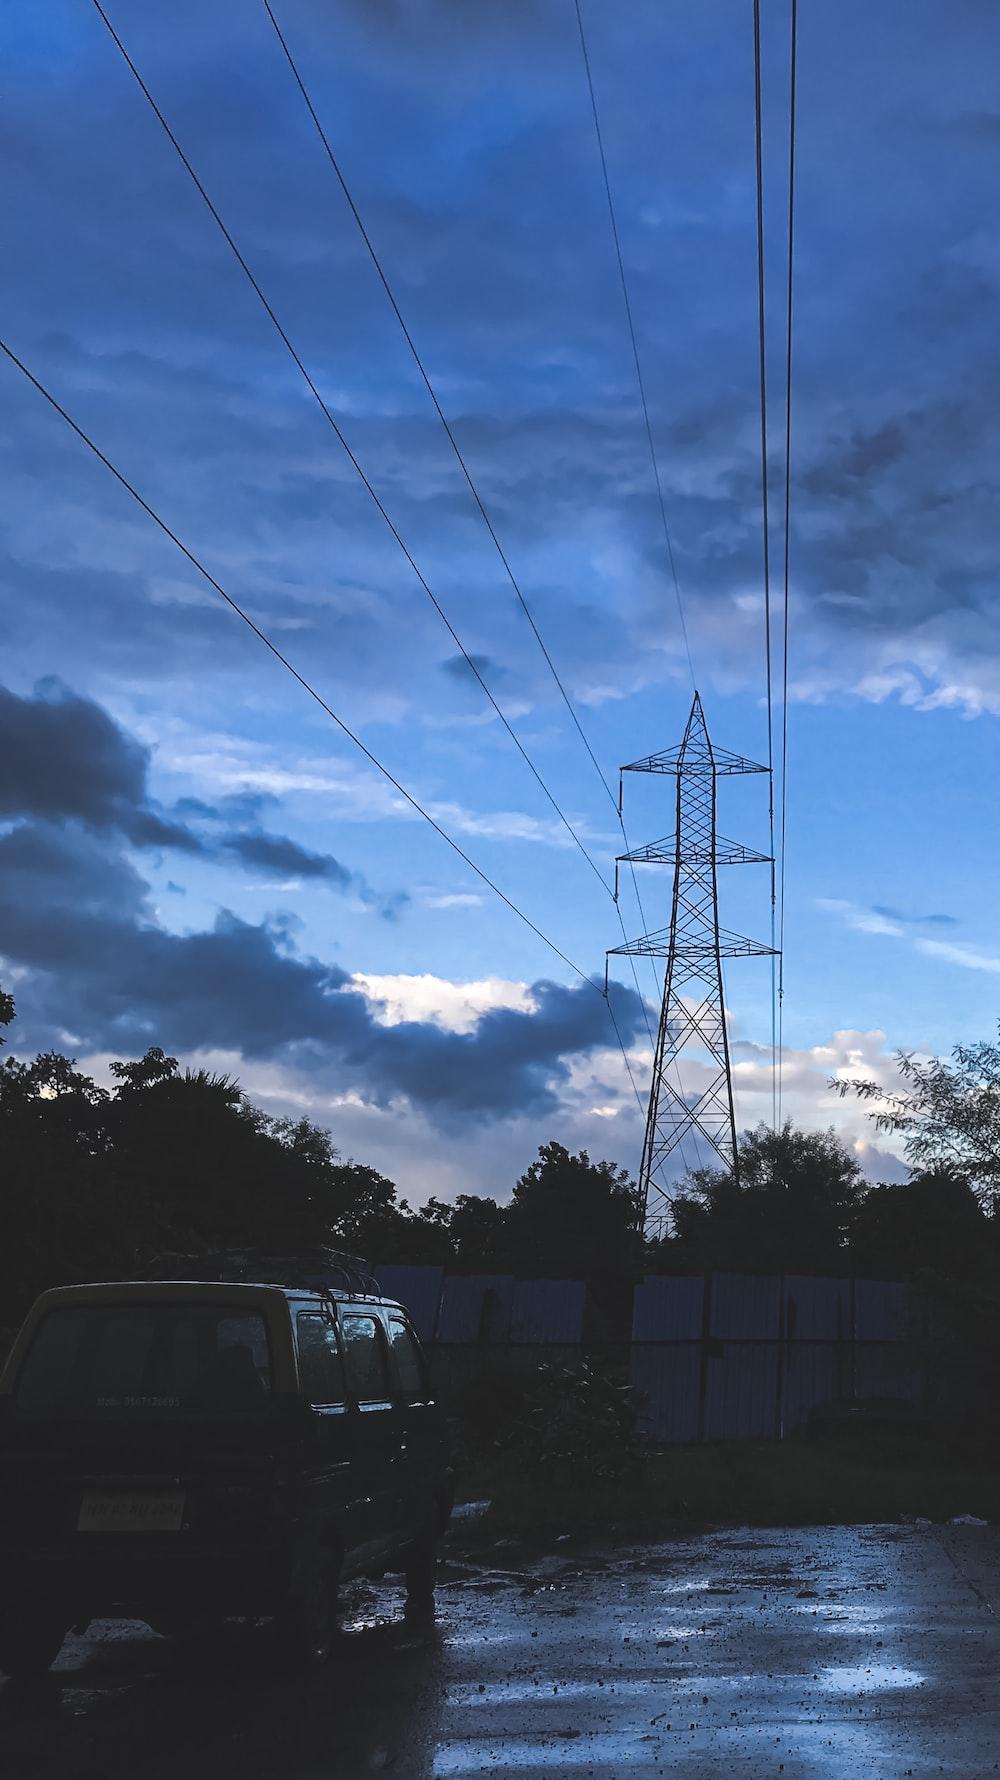 van under electric cable